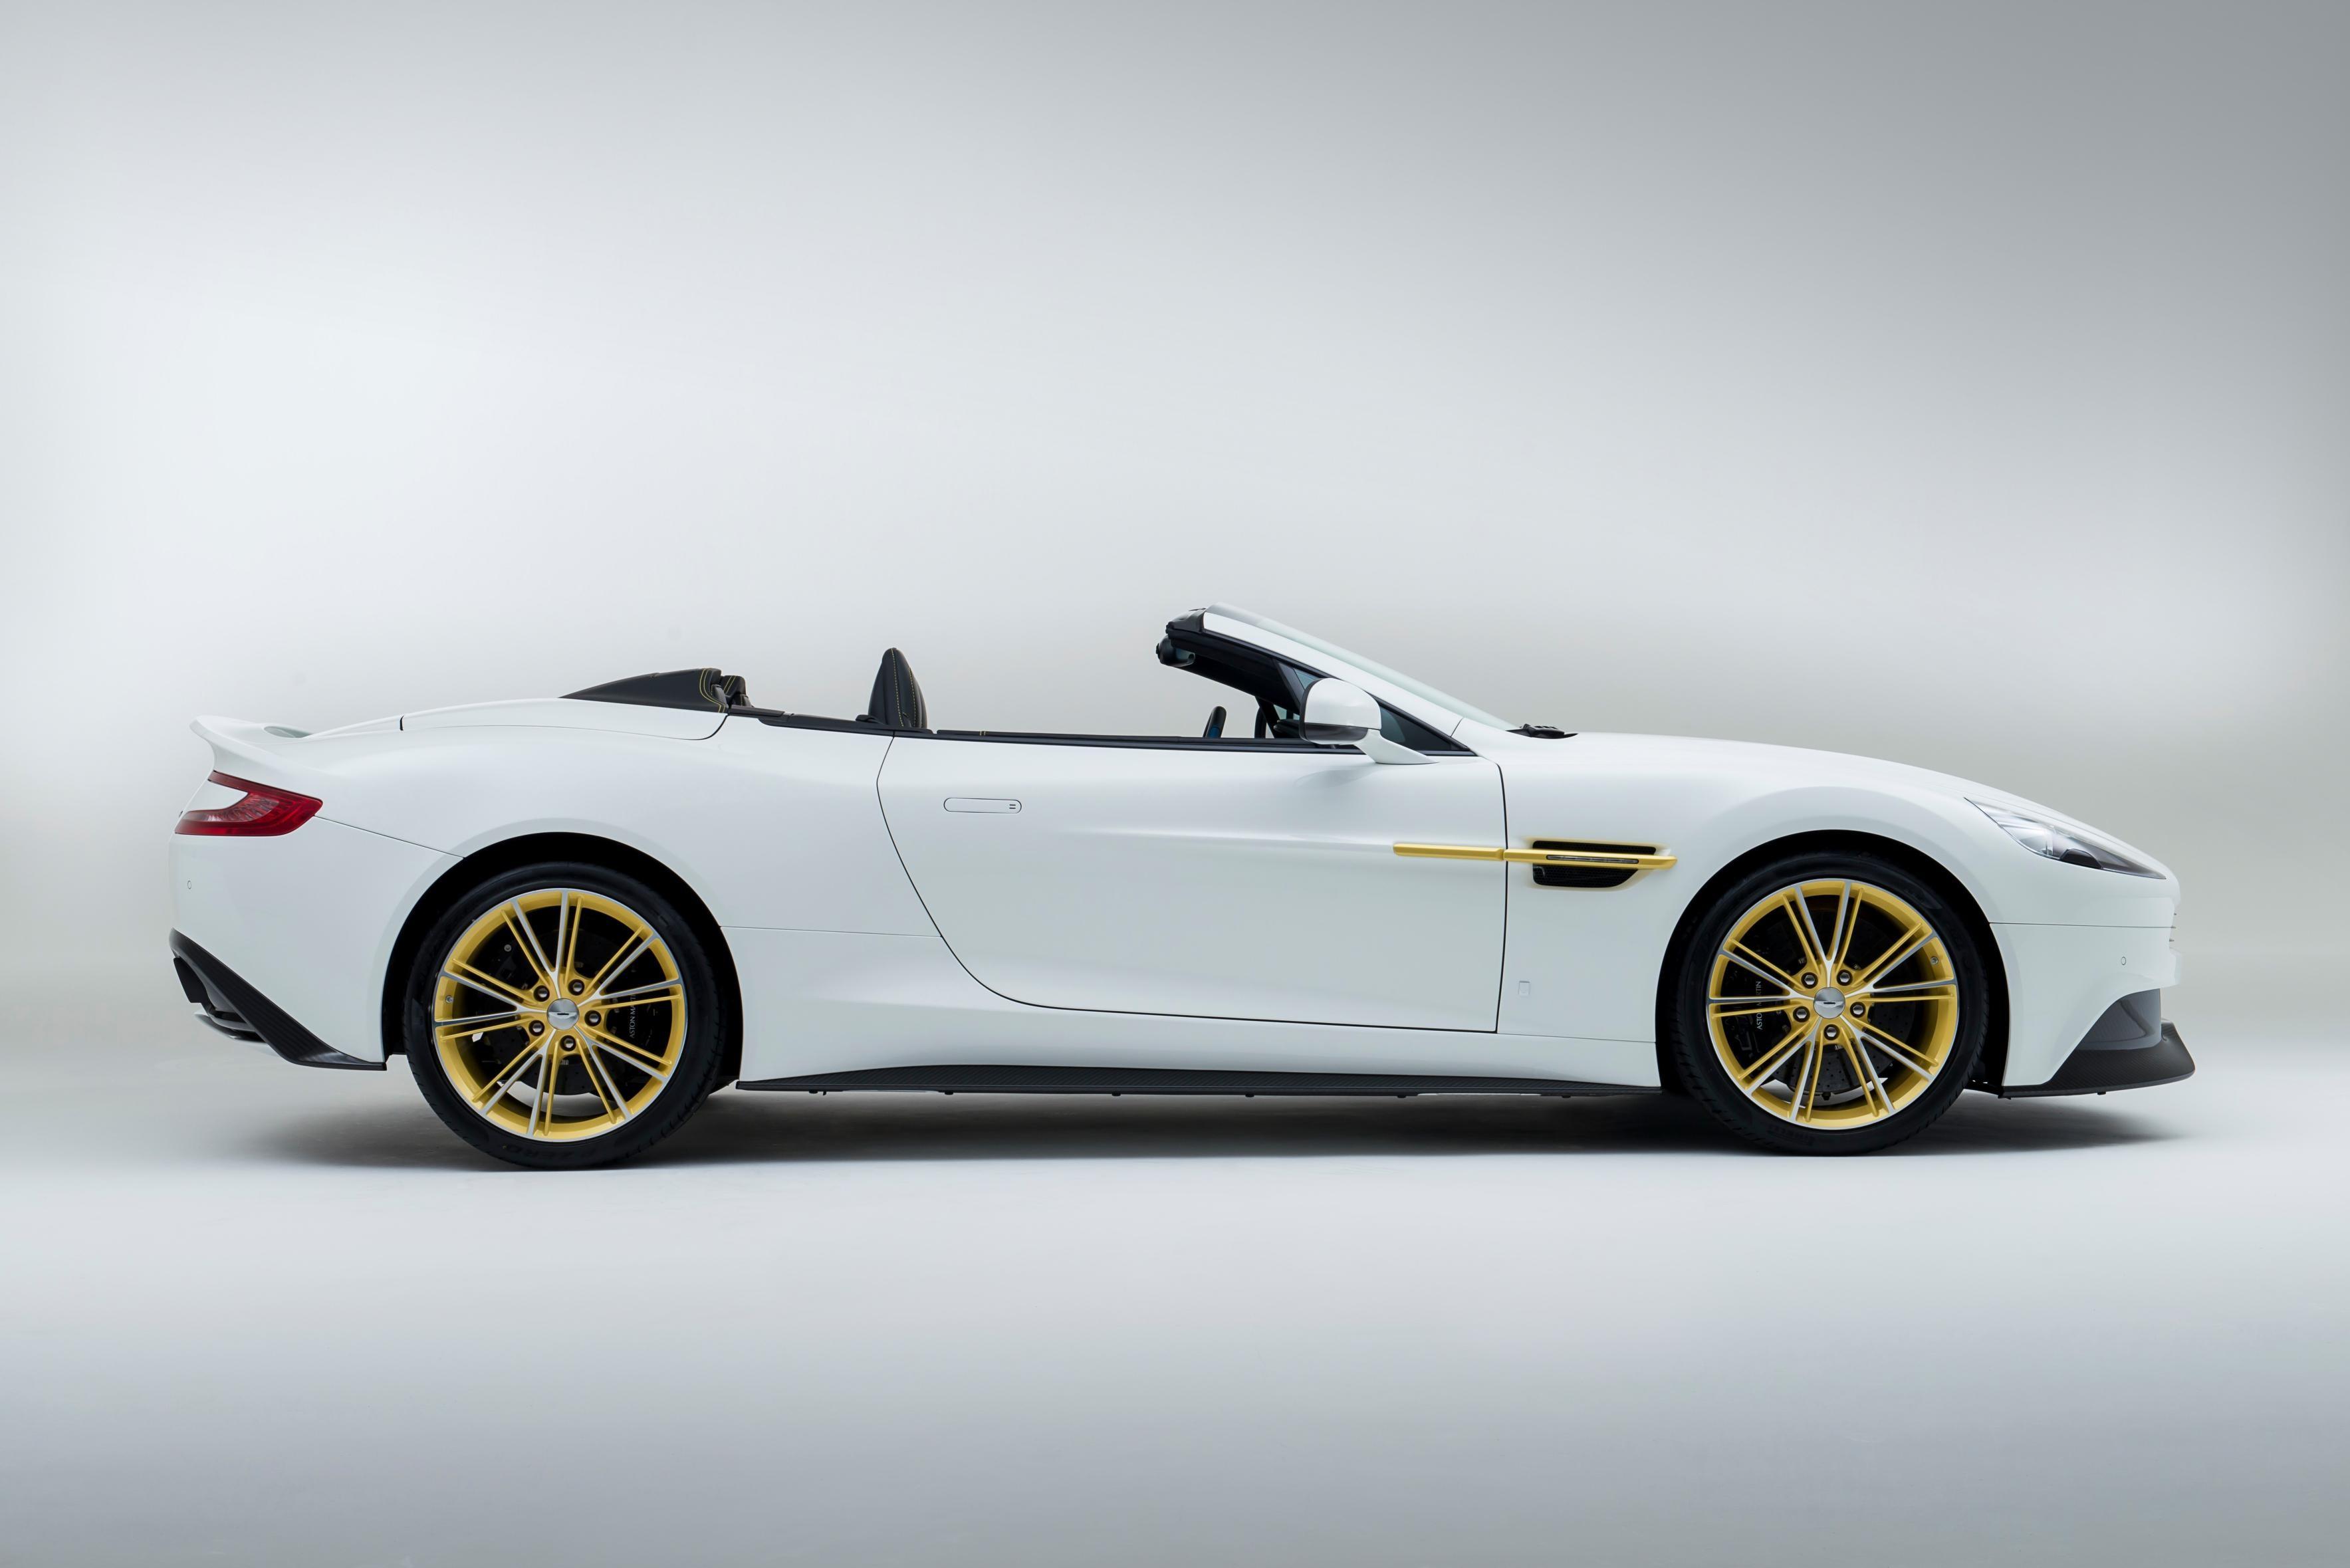 1964 Aston Martin Db5 >> James Bond Wouldn't Drive the Aston Martin Works 60th Anniversary Vanquish - autoevolution